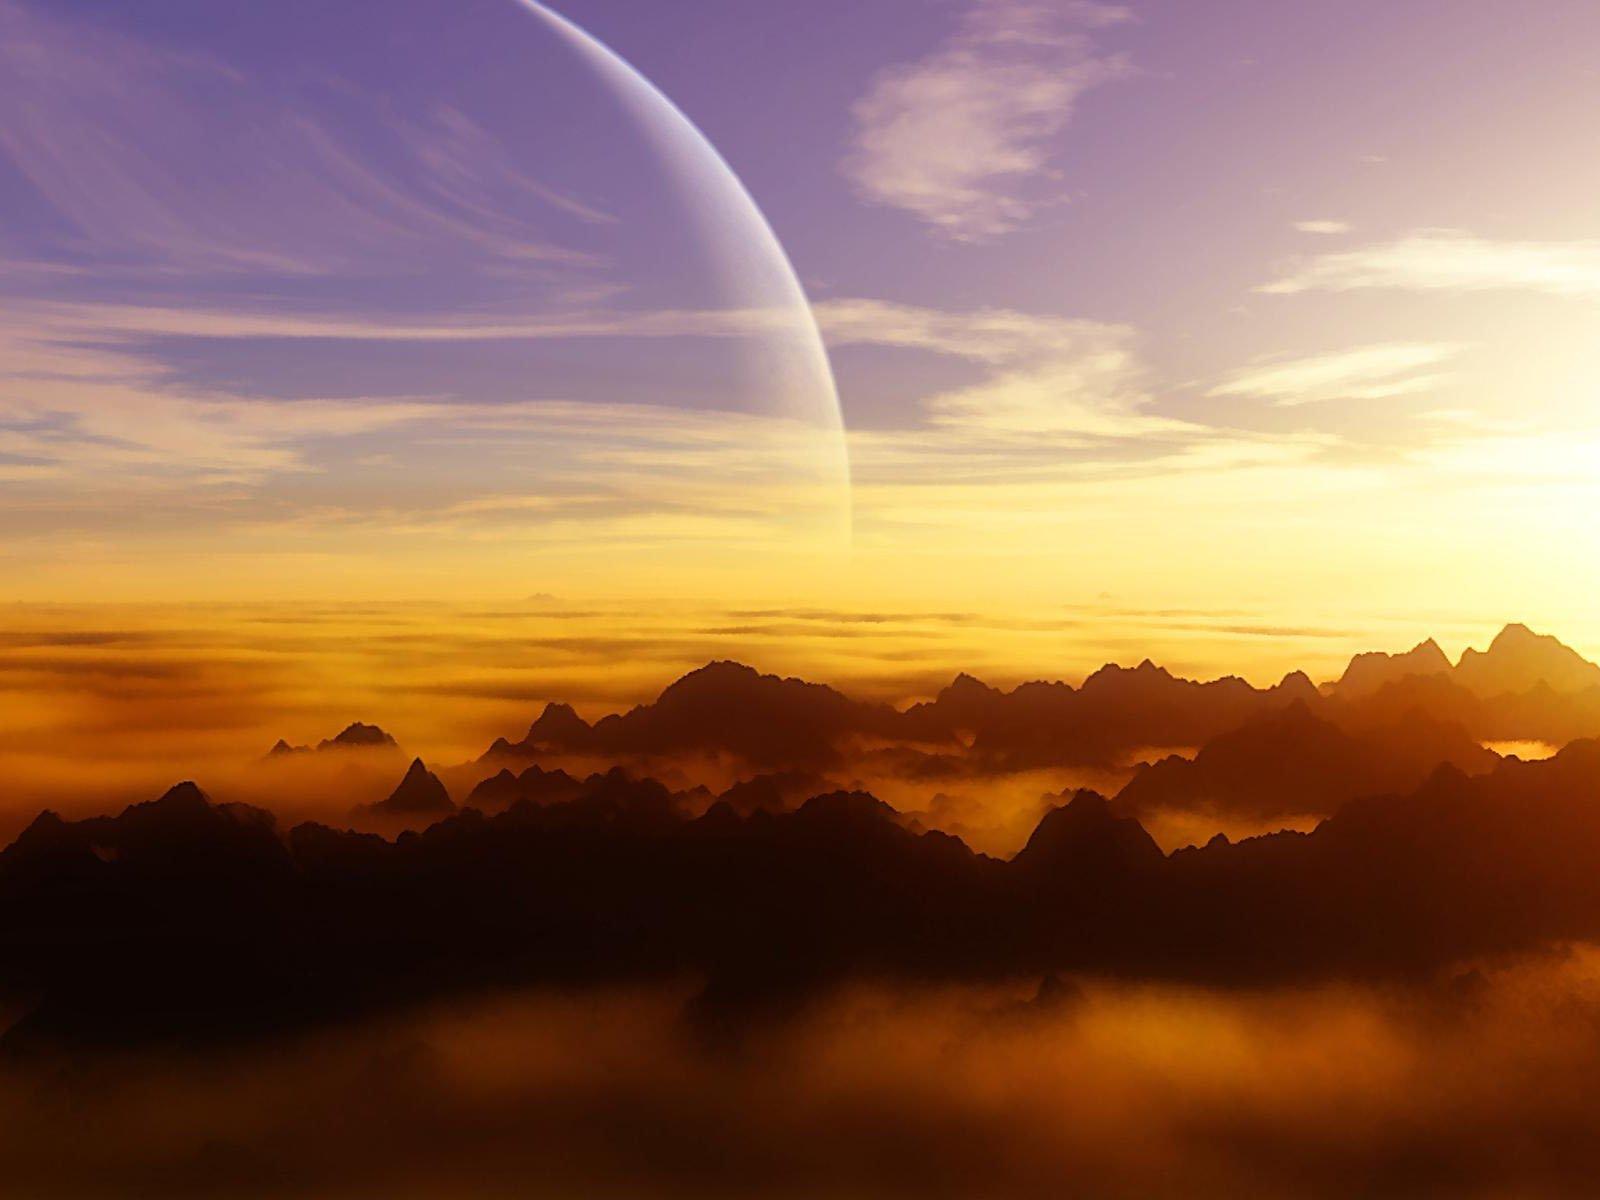 wallpapers: Alien Sunset Wallpapers